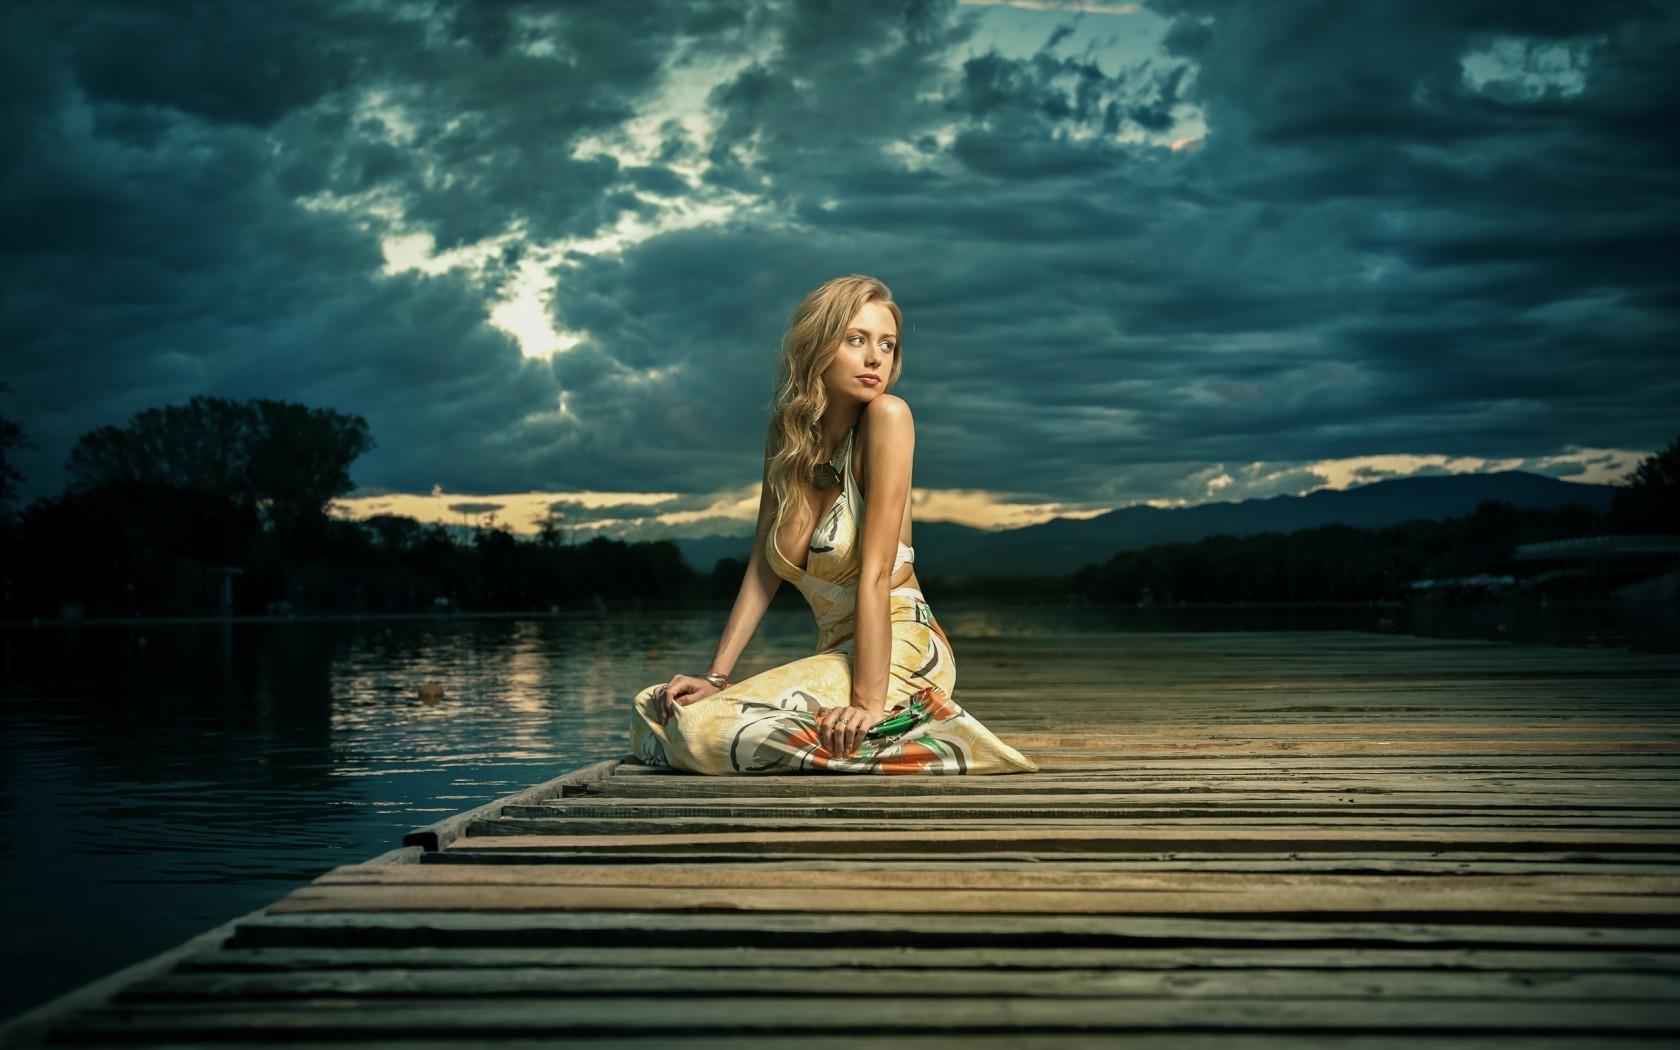 1400x900 Girl Wallpaper Girl Alone Sitting Near Lake Hd Girls 4k Wallpapers